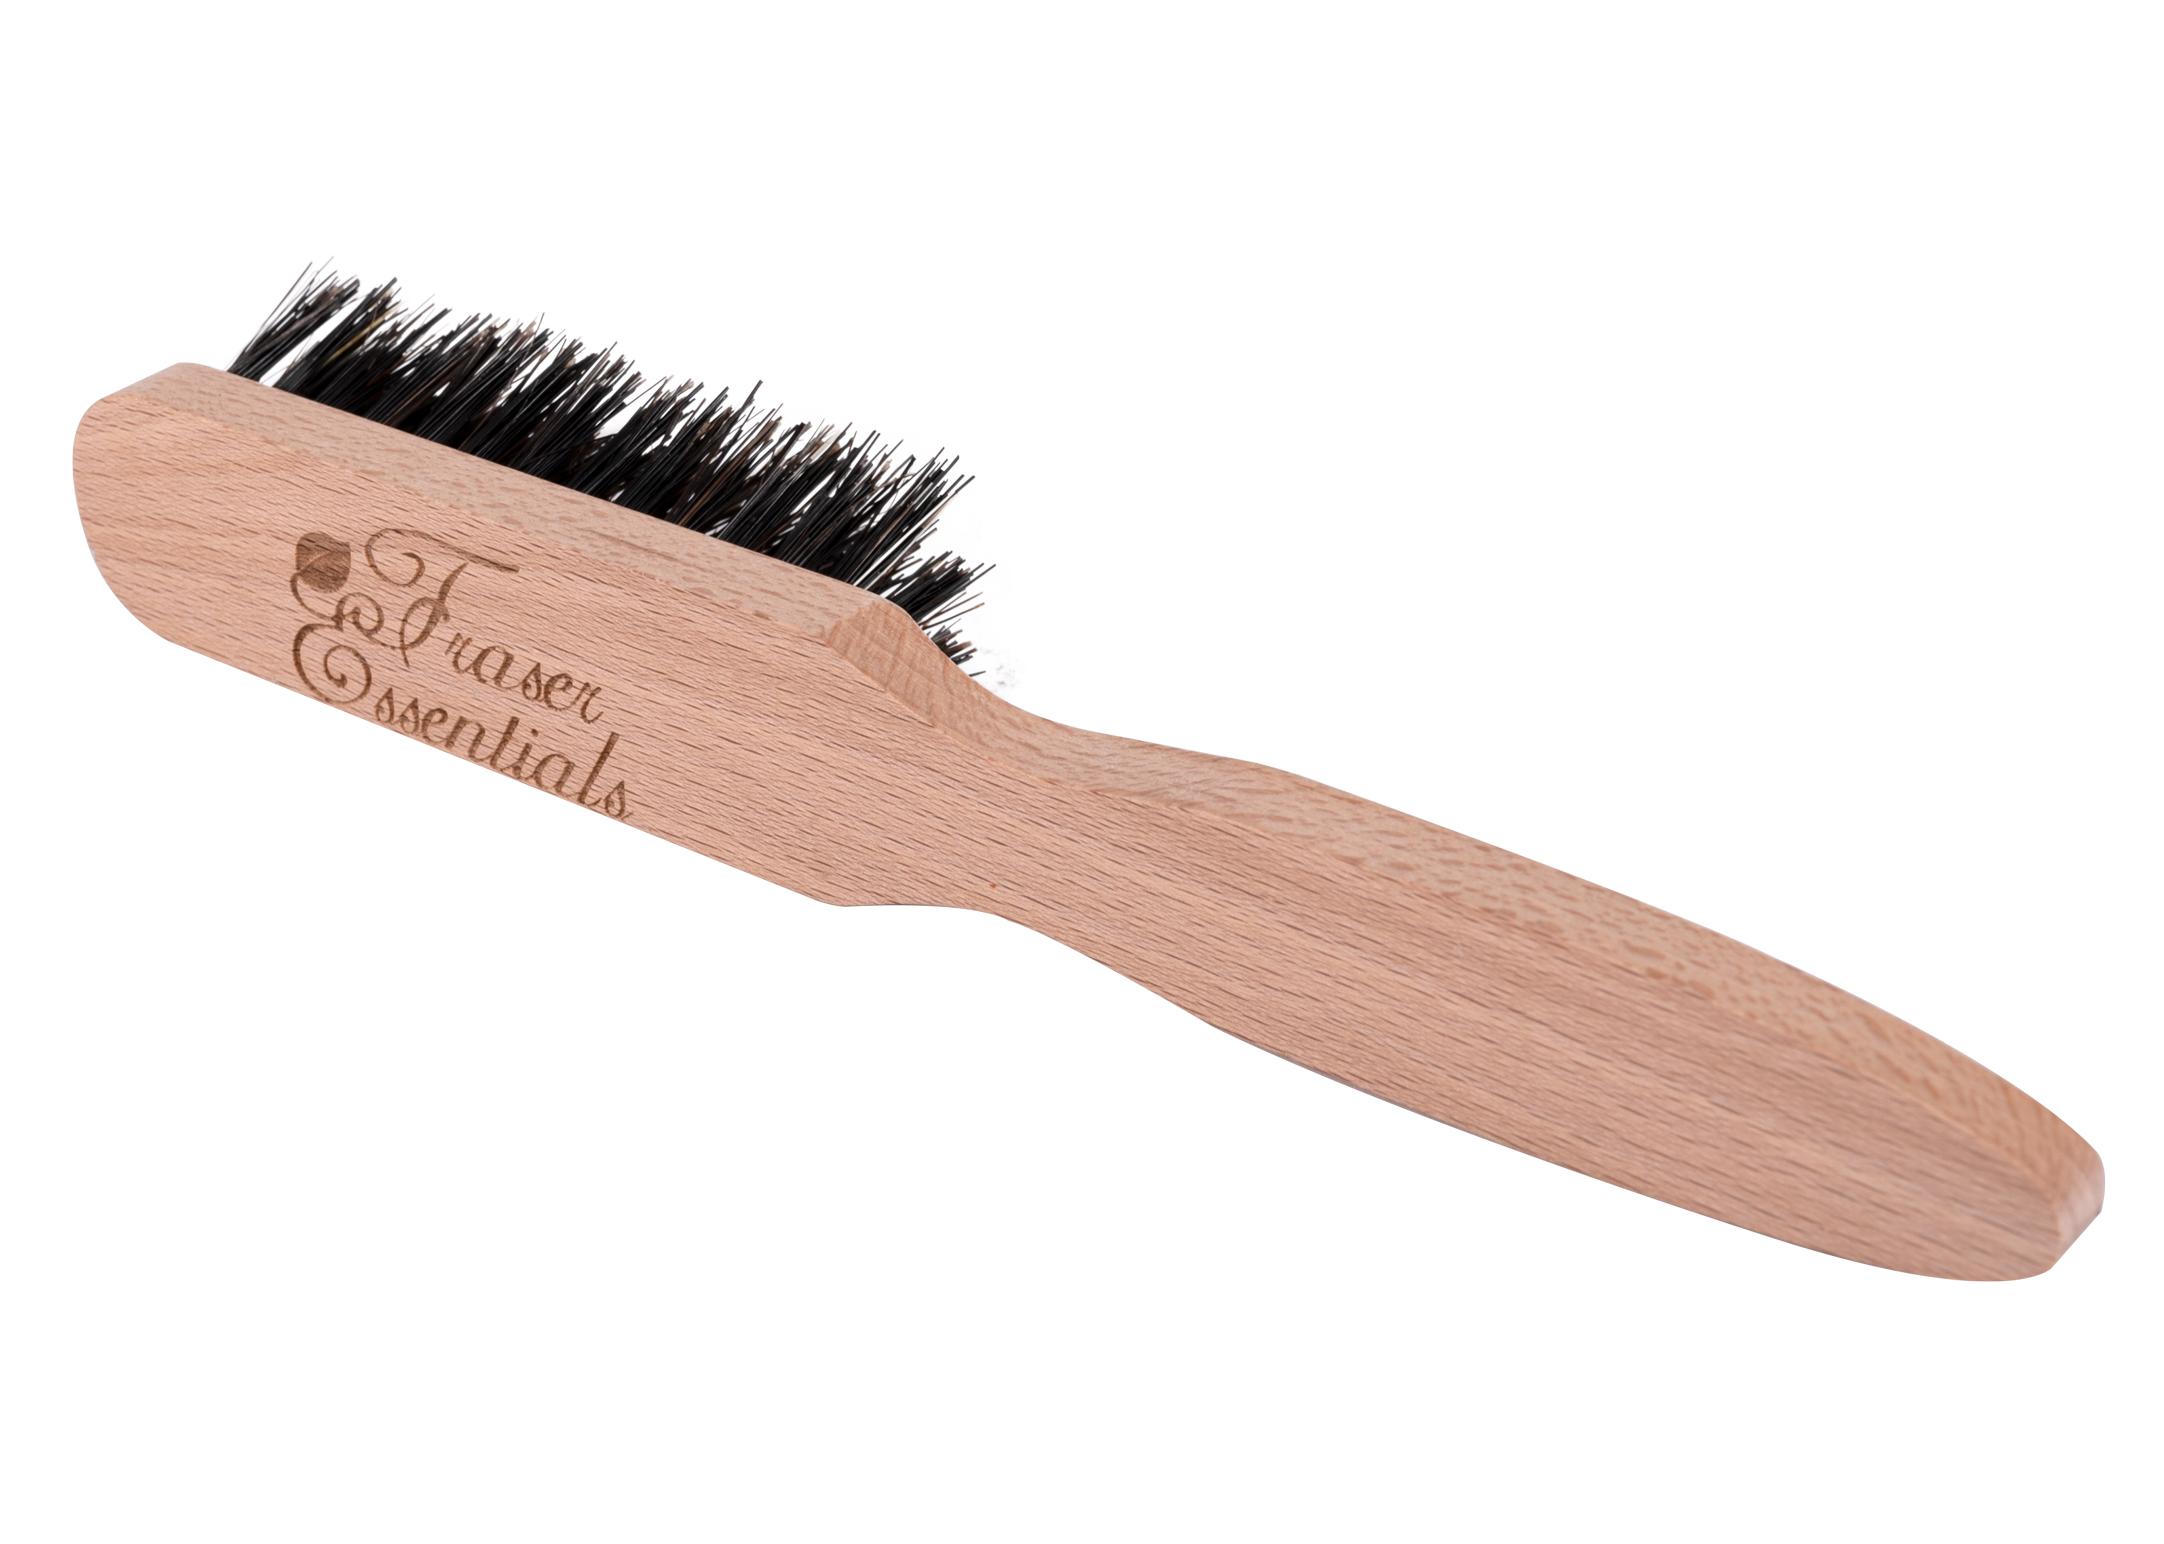 Fraser Essentials Oblong Boar Bristle Brush